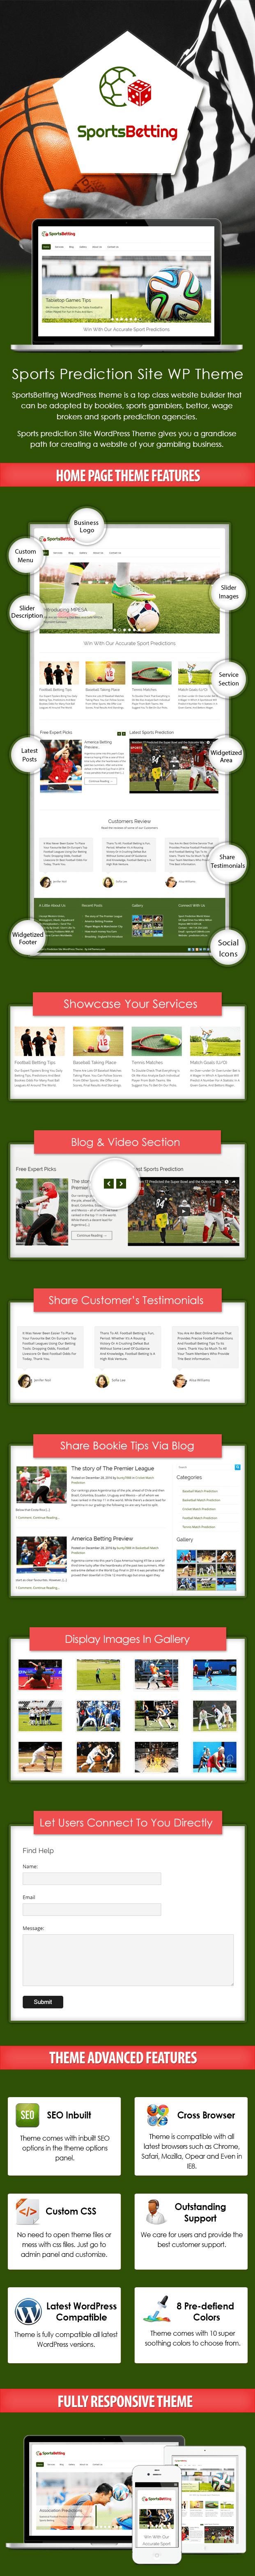 Sports Prediction Site WP Theme